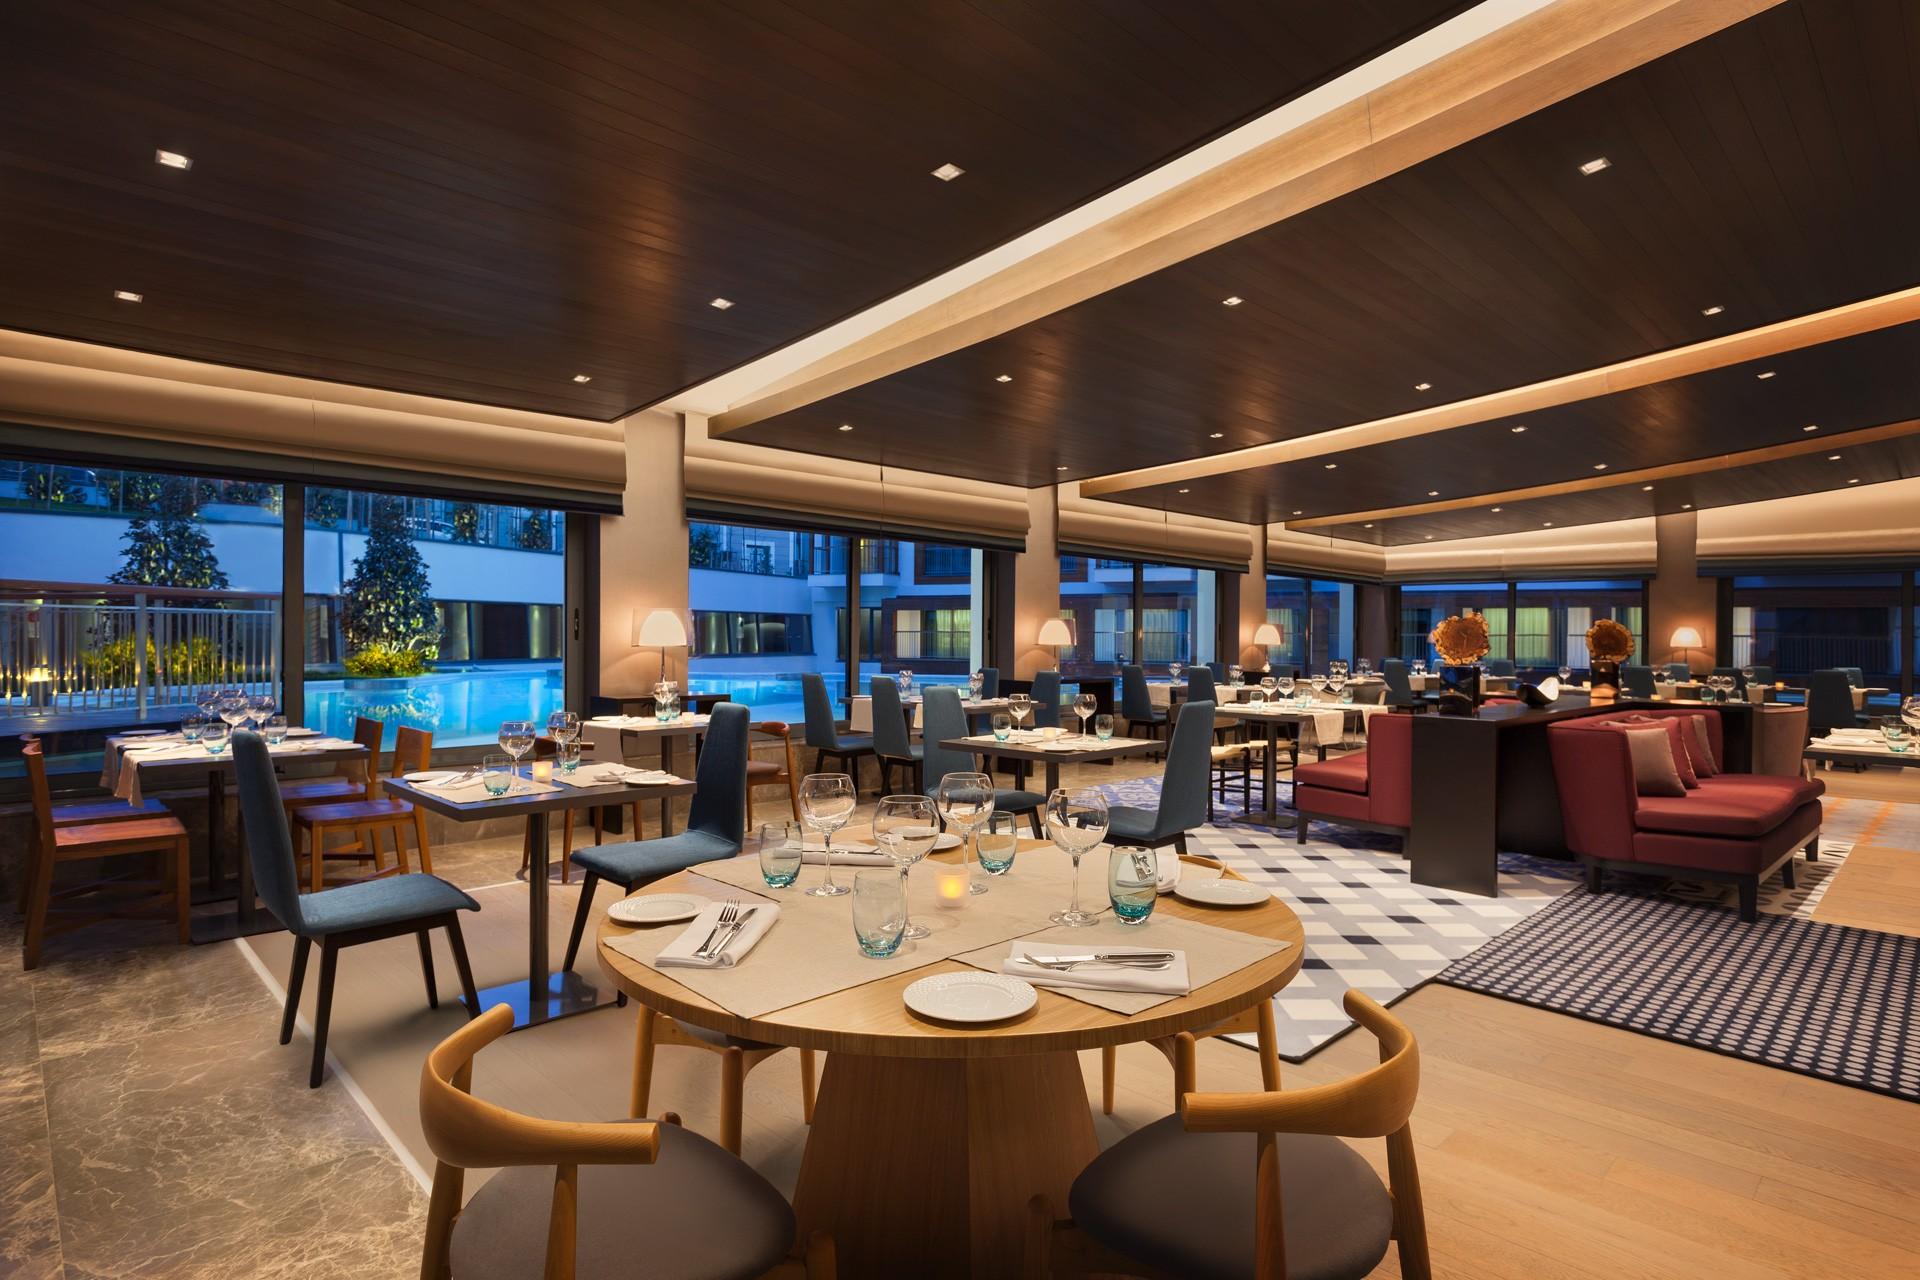 Radisson Blu Hotel Tuzla | Casa Grill Restaurant